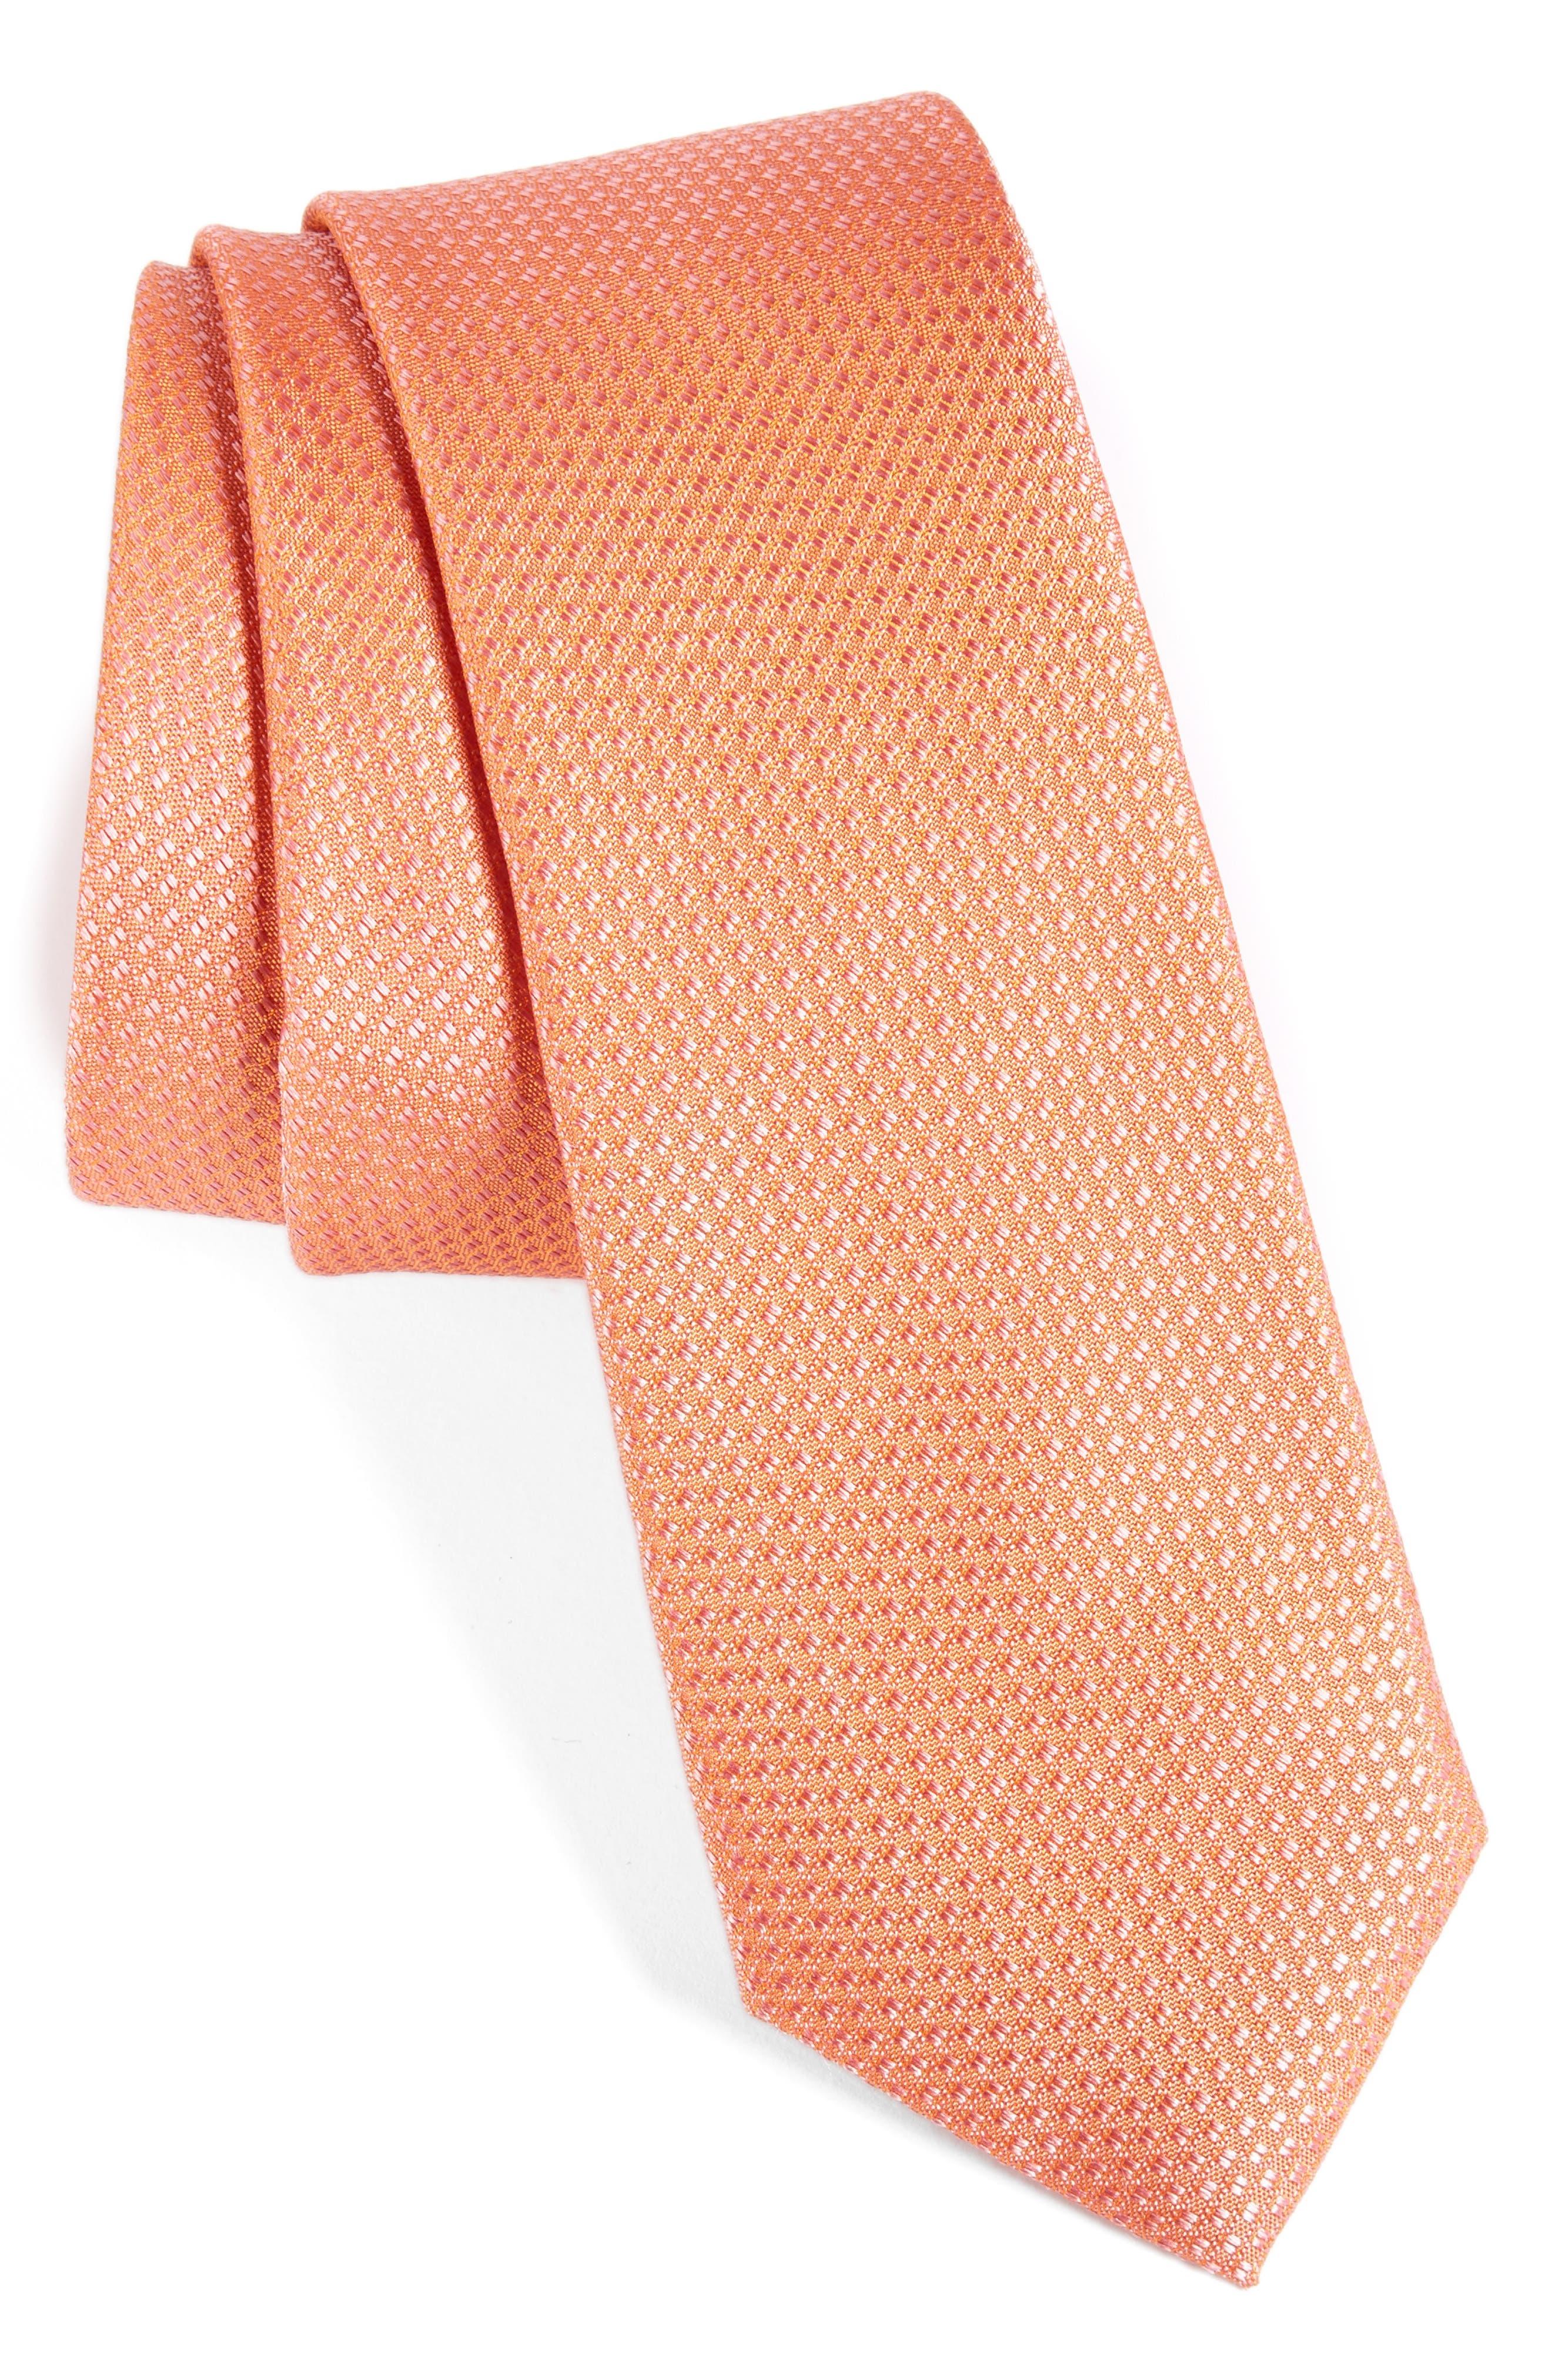 Calibrate Seattle Textured Silk Tie